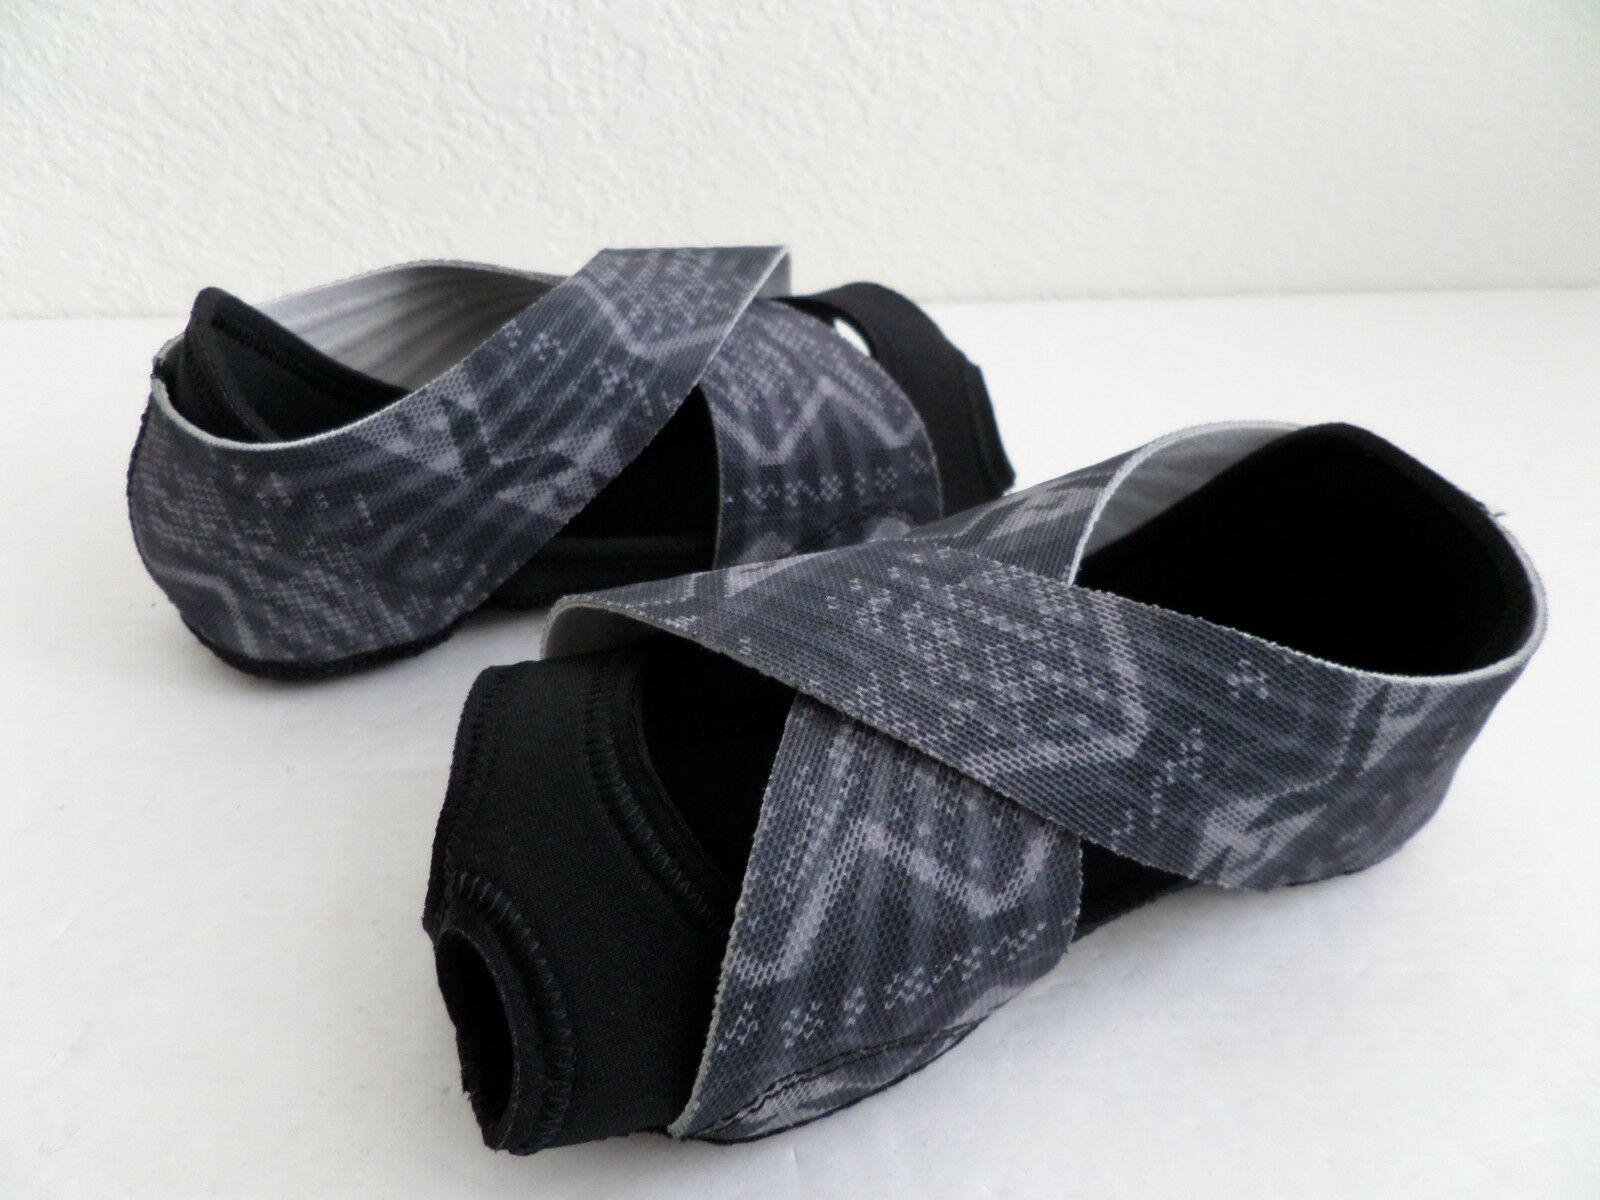 Nike Studio Wrap 3 Women's Training Shoe Yoga Dance Black Grey 684864 001